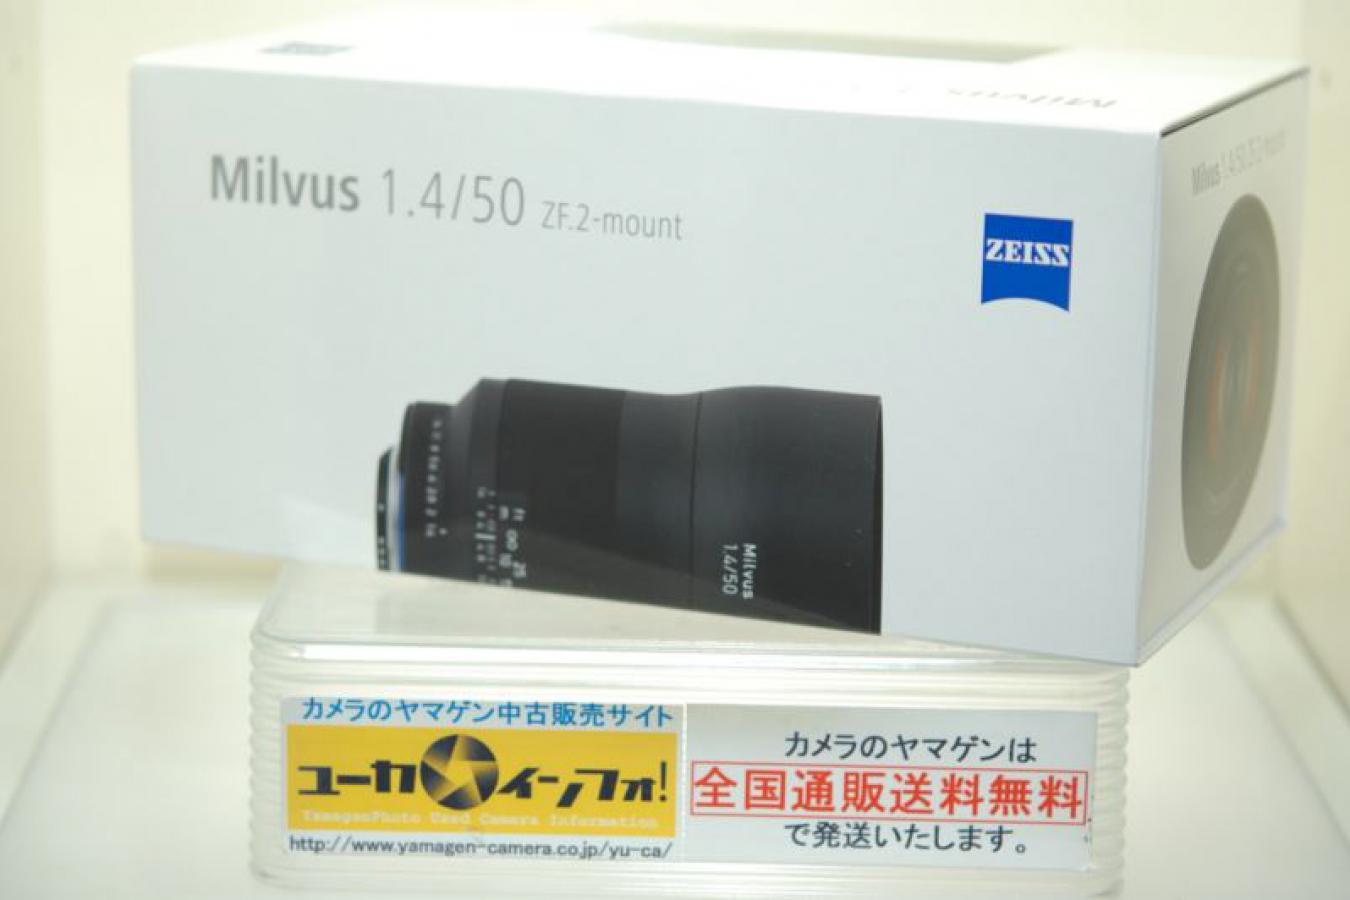 【完全新品】 Carl Zeiss Milvus 50mm F1.4 ZF.2 【CPU付ニコンAi-S用】